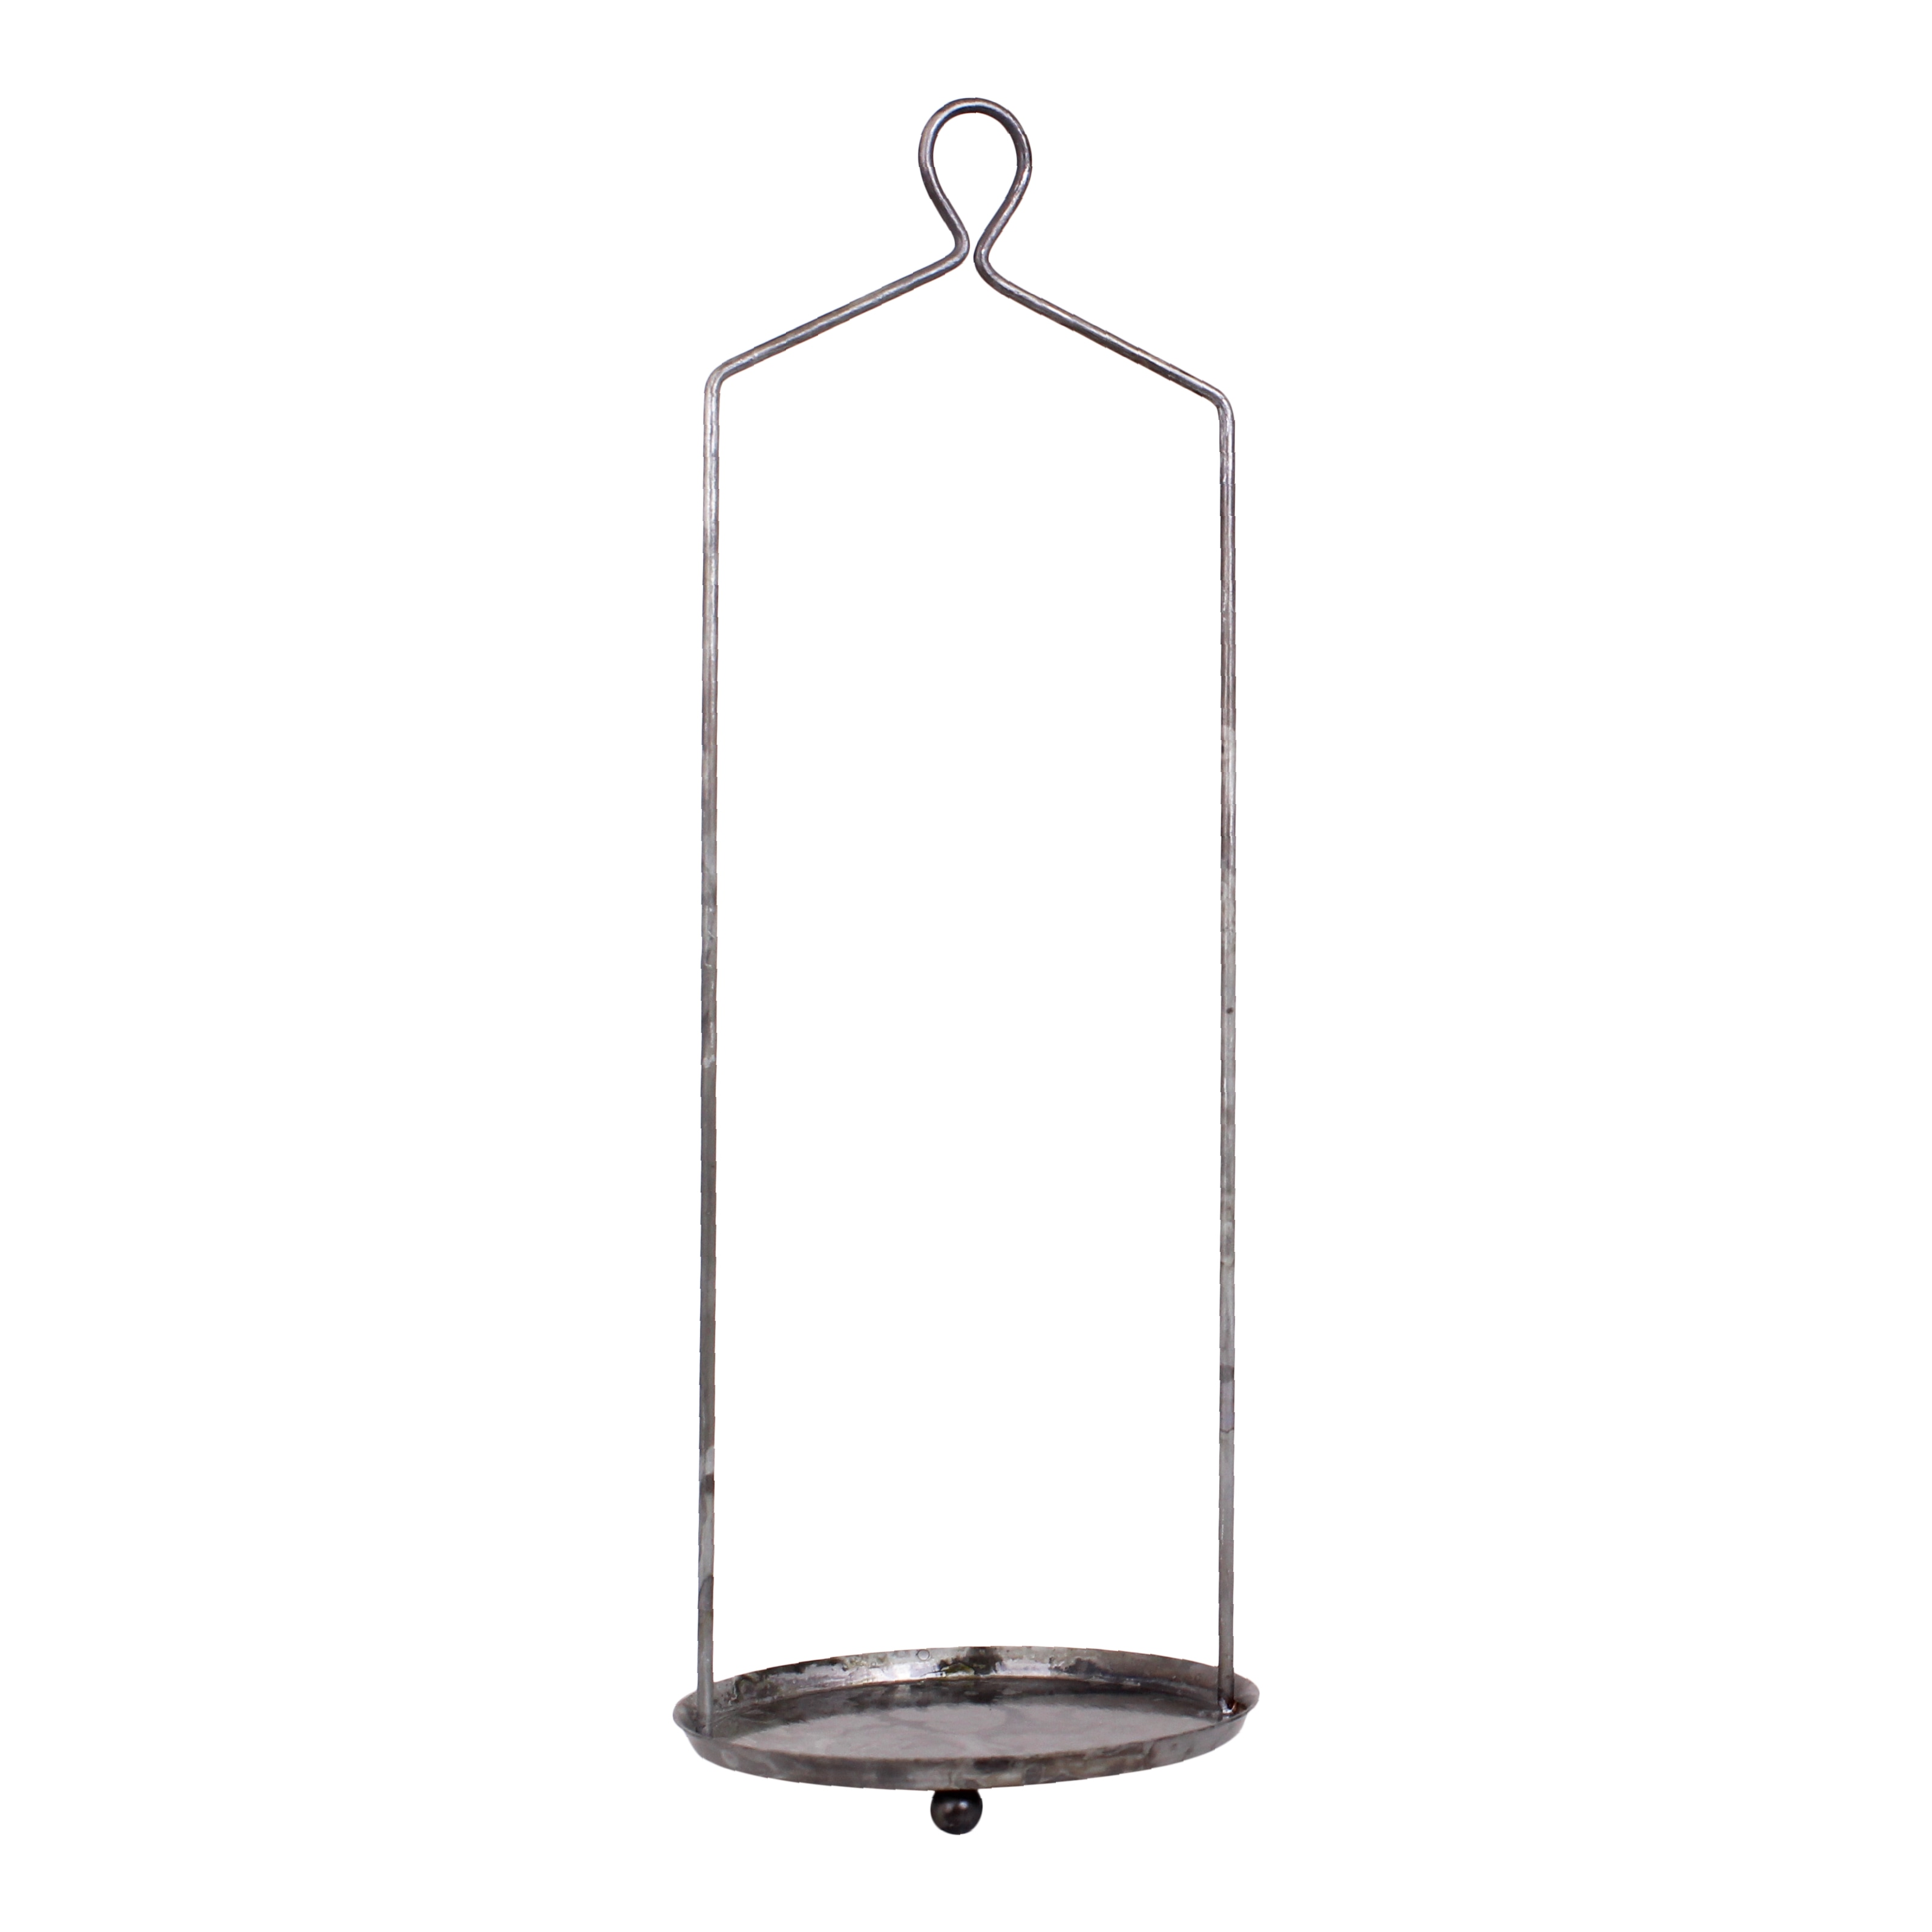 Hanging Stand for Pot Antique Zinc High